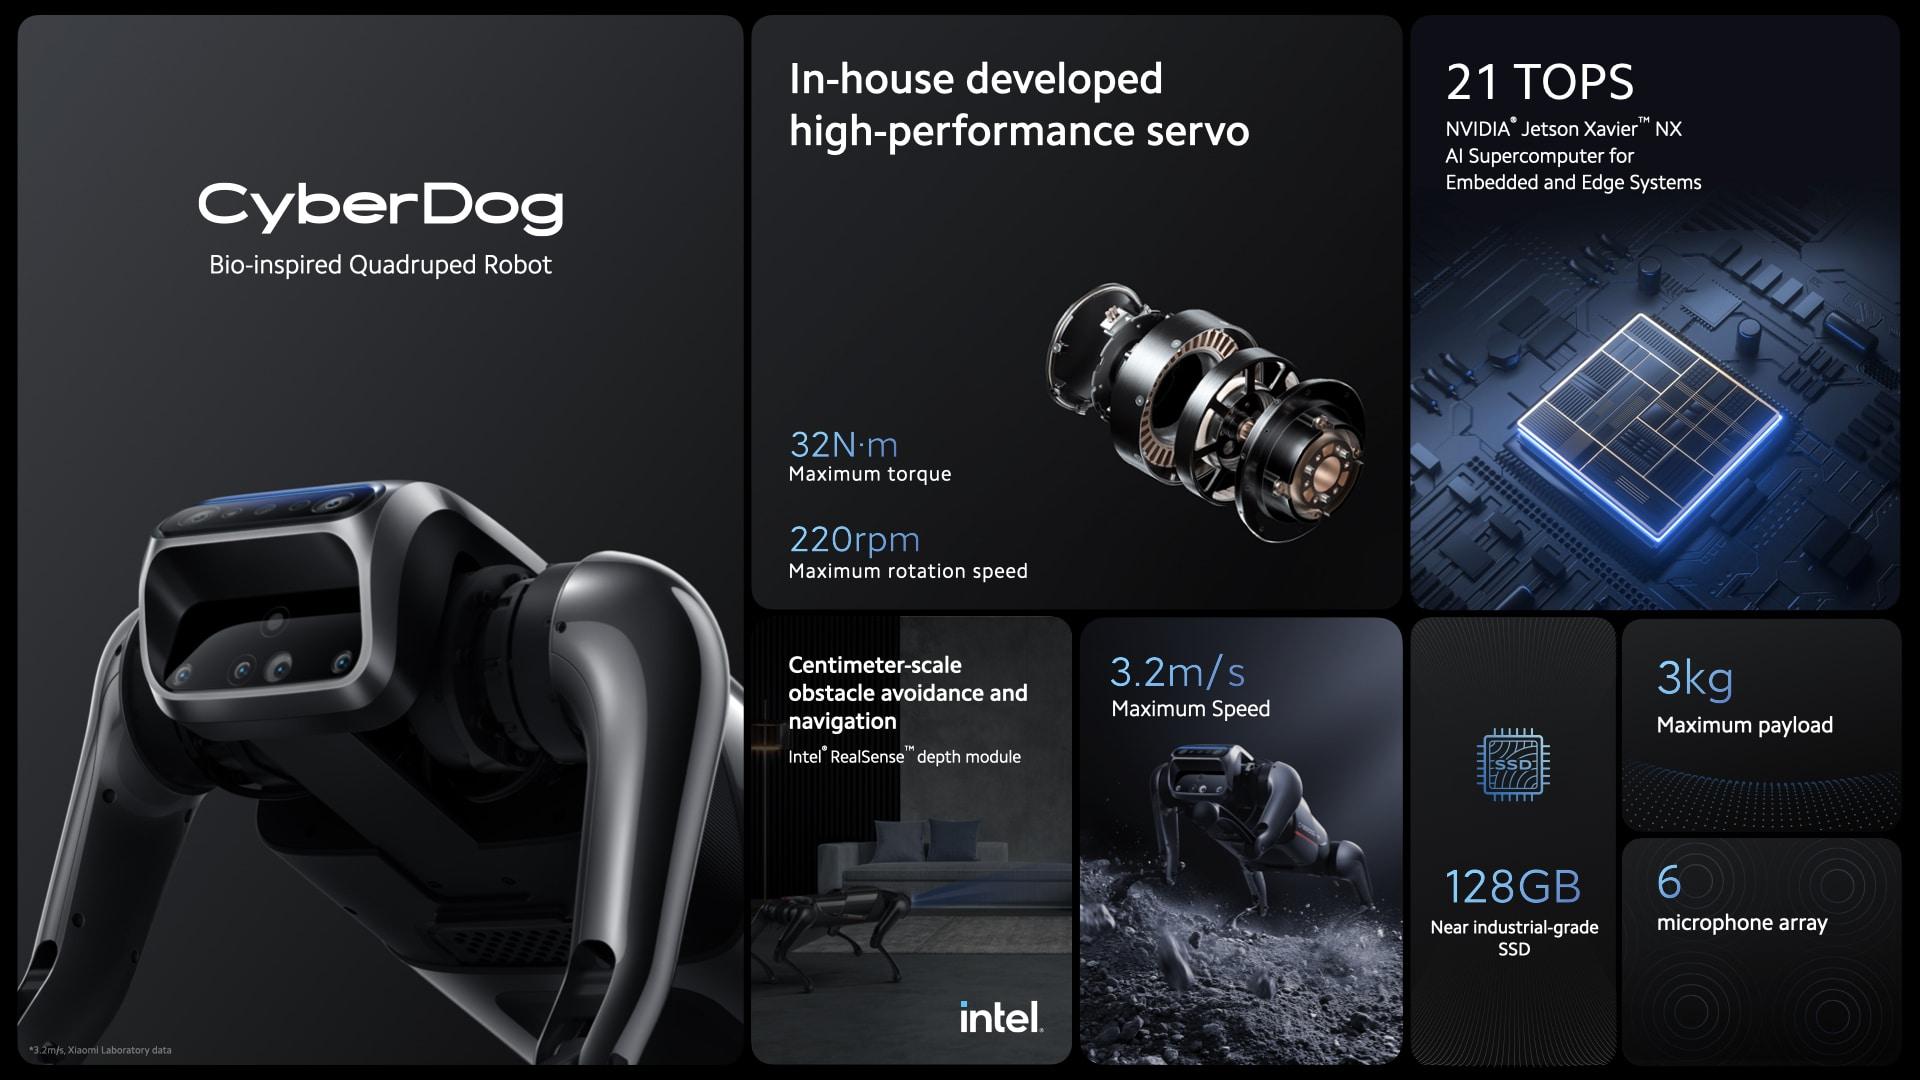 cyberdog specs